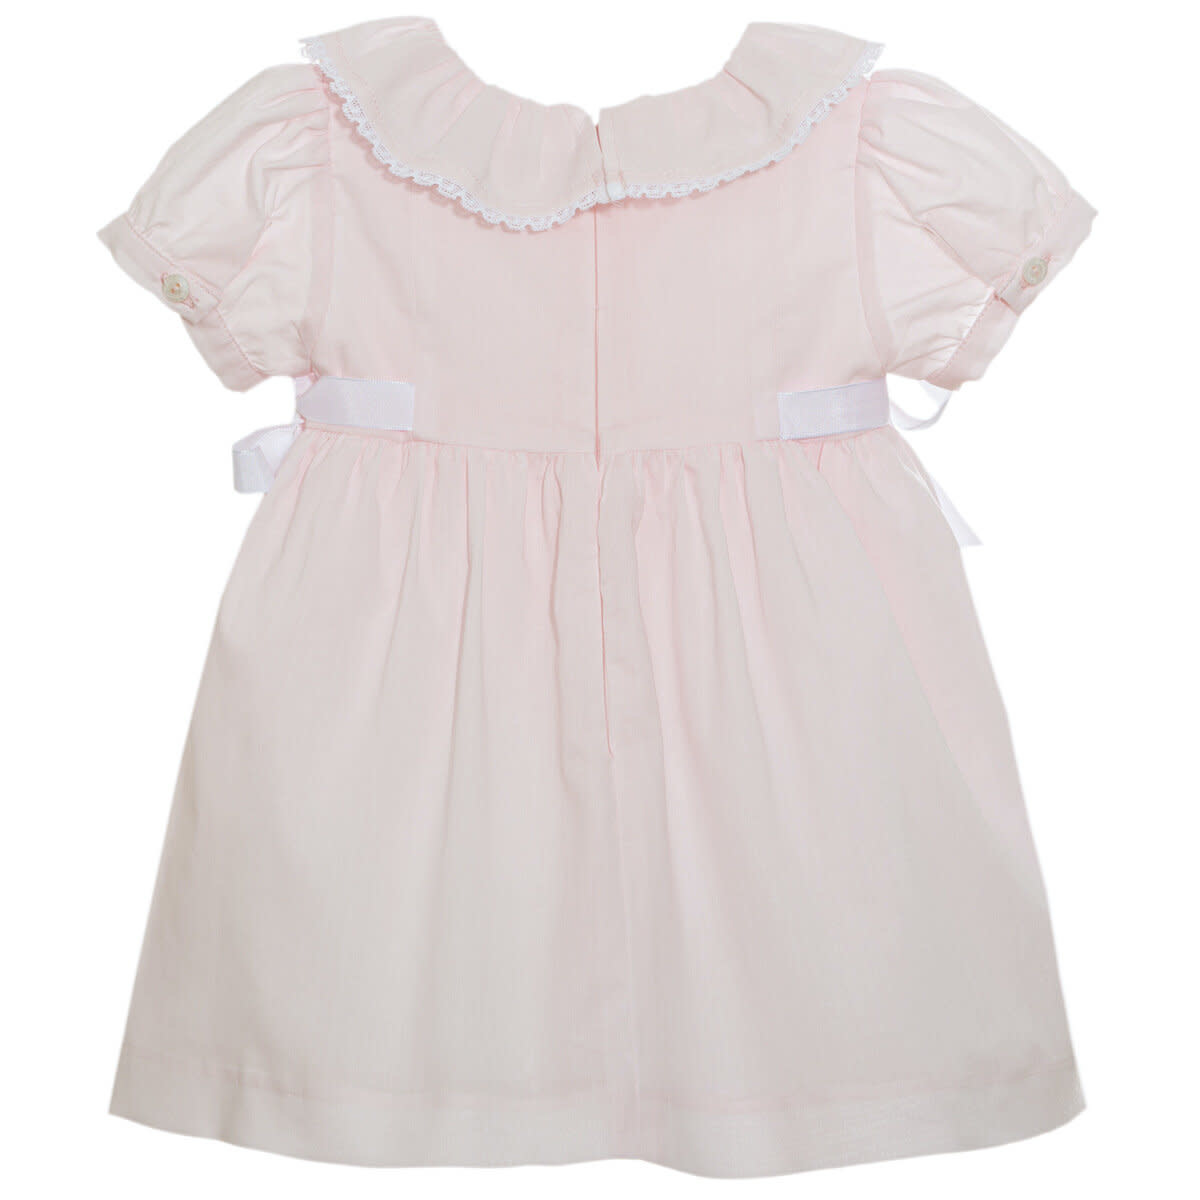 Patachou Patachou Woven Frill Dress 3044 S21